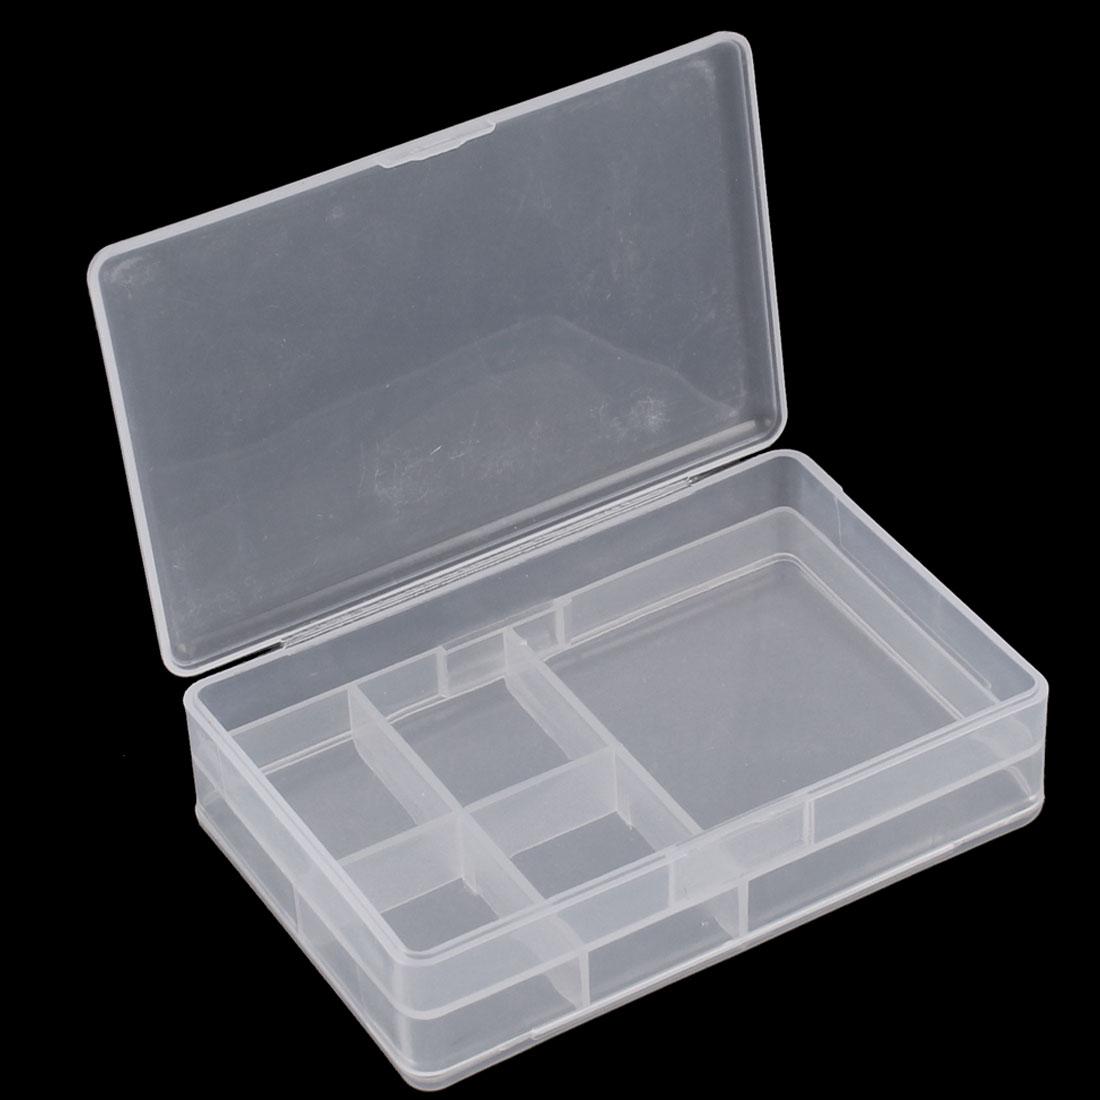 Plastic Dual Layers 5 Compartments Storage Case Box Organizer Conatiner - image 2 of 3